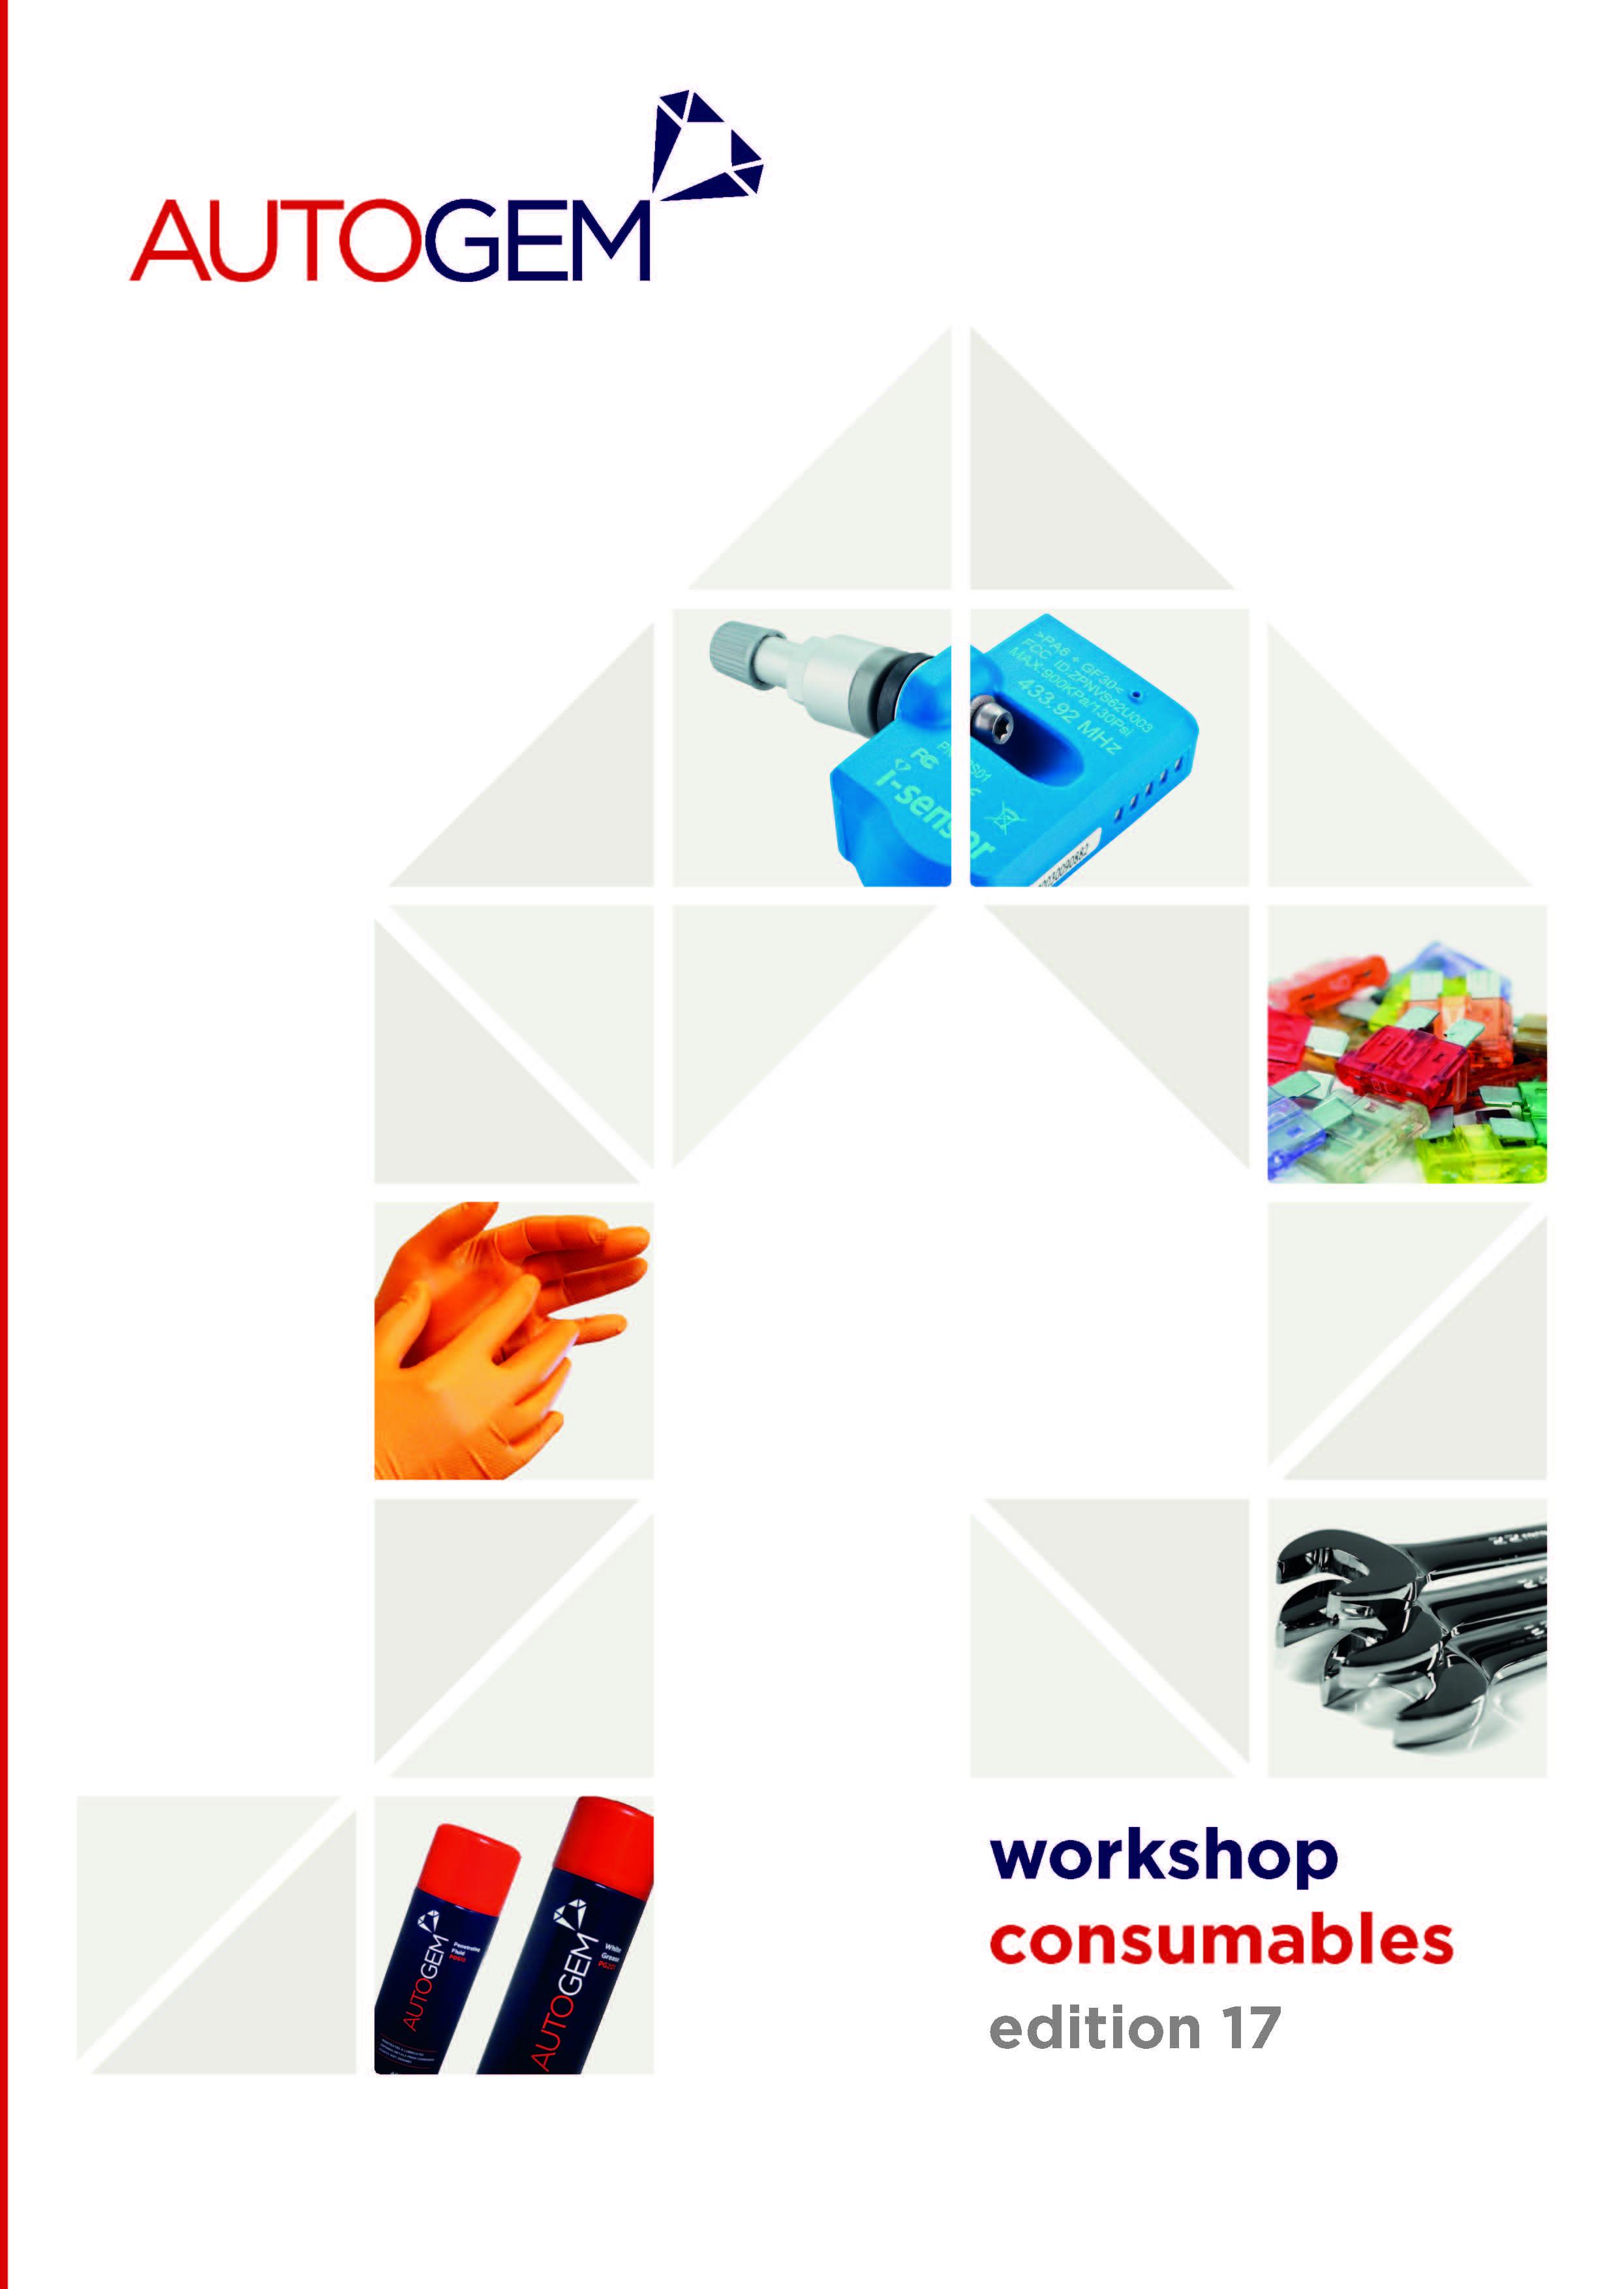 Autogem_Consumables_Catalogue_Edition_17